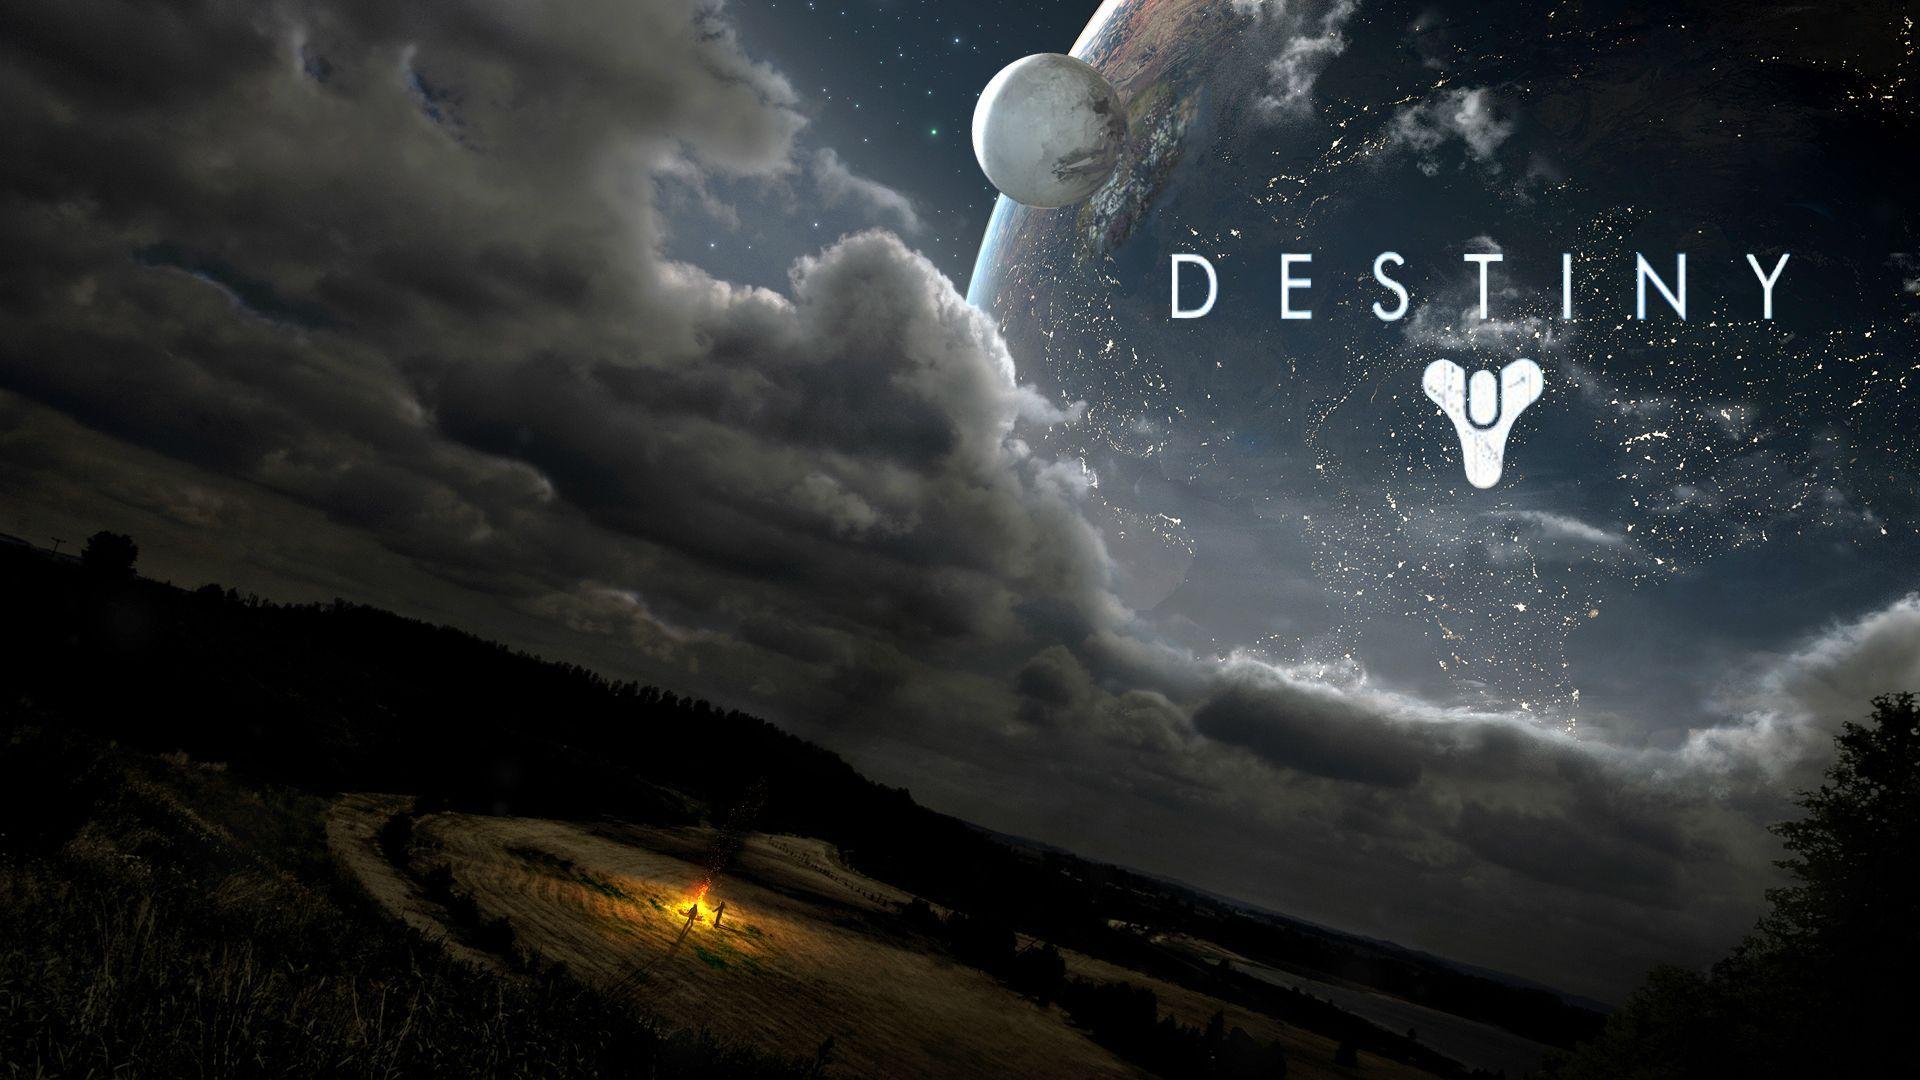 Destiny Wallpaper Widescreen HNt Destiny Destiny backgrounds 1920x1080